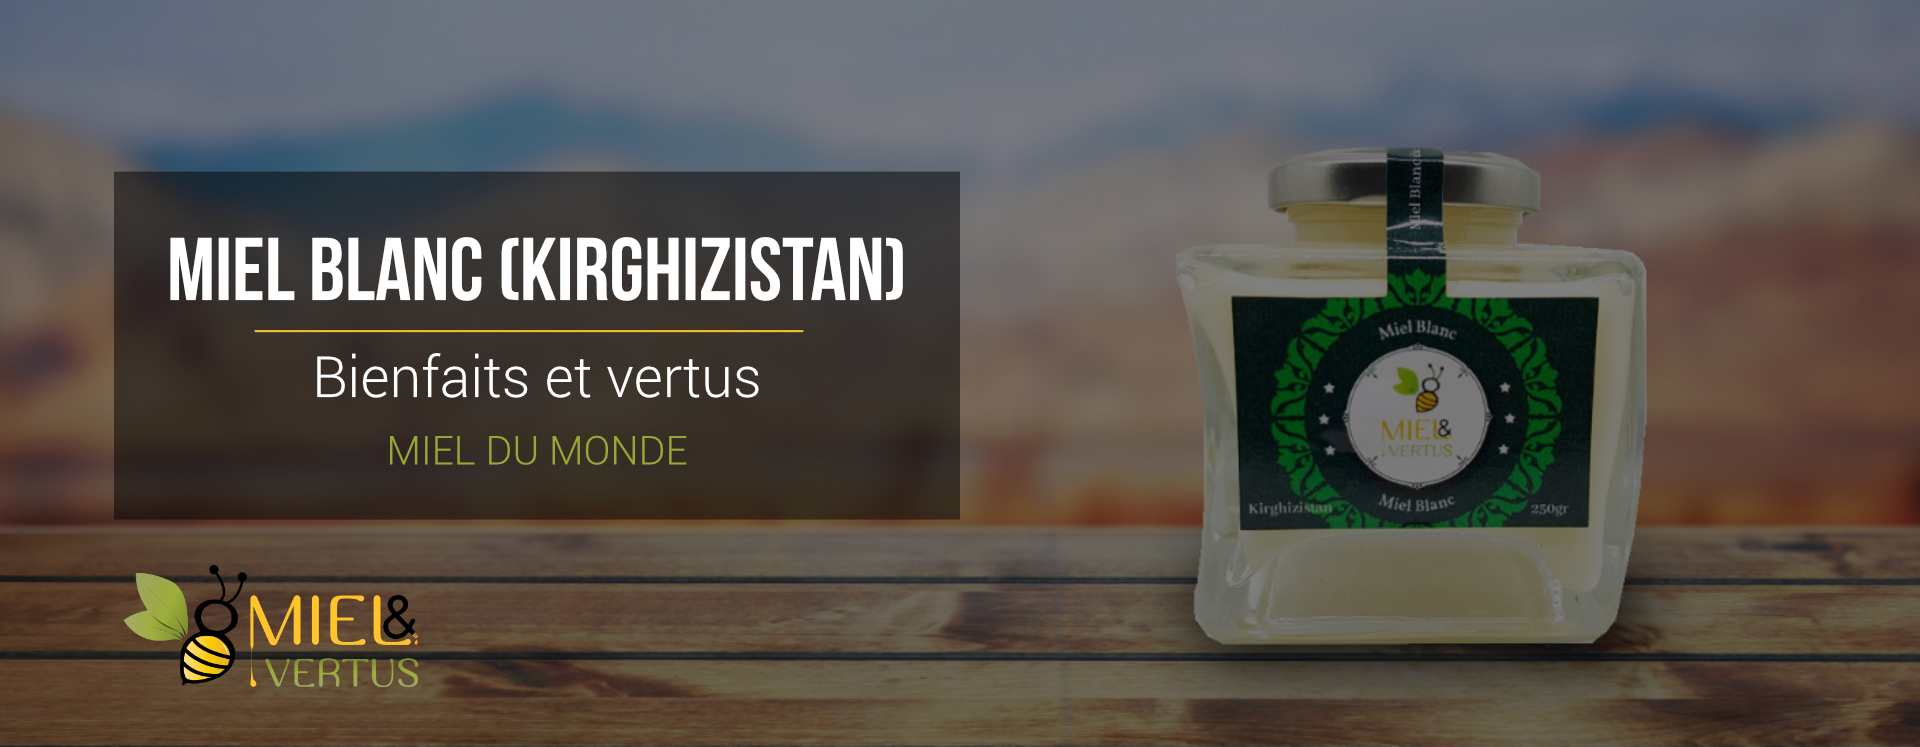 Miel-blanc-kirghizistan-bienfaits-vertus